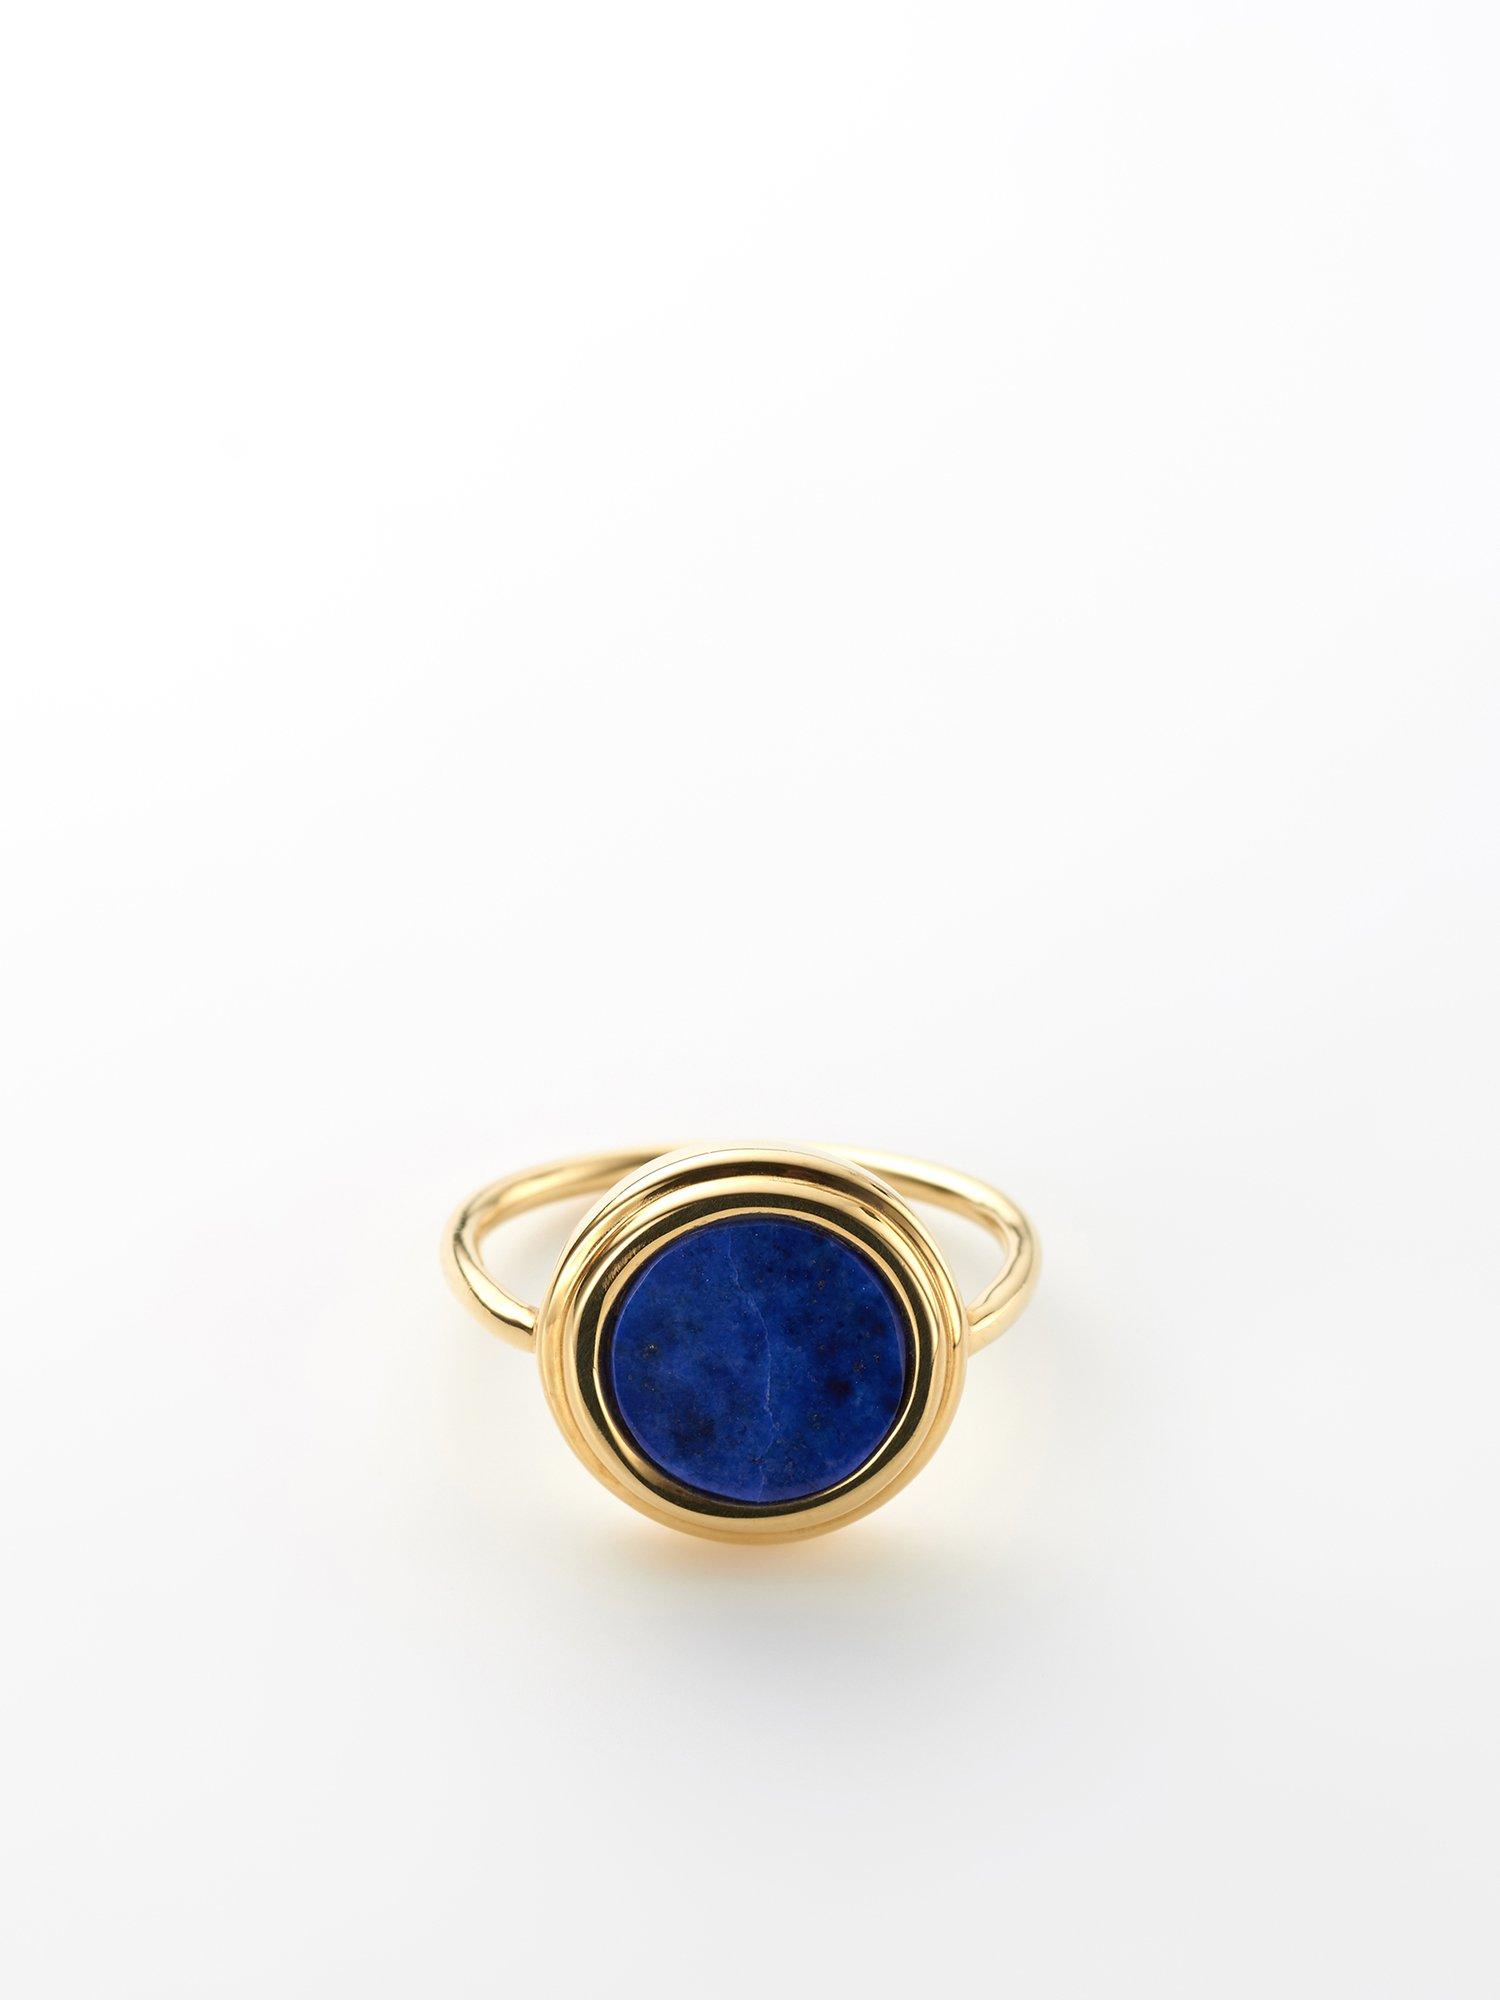 SOPHISTICATED VINTAGE / Planet ring / Lapis pyrite